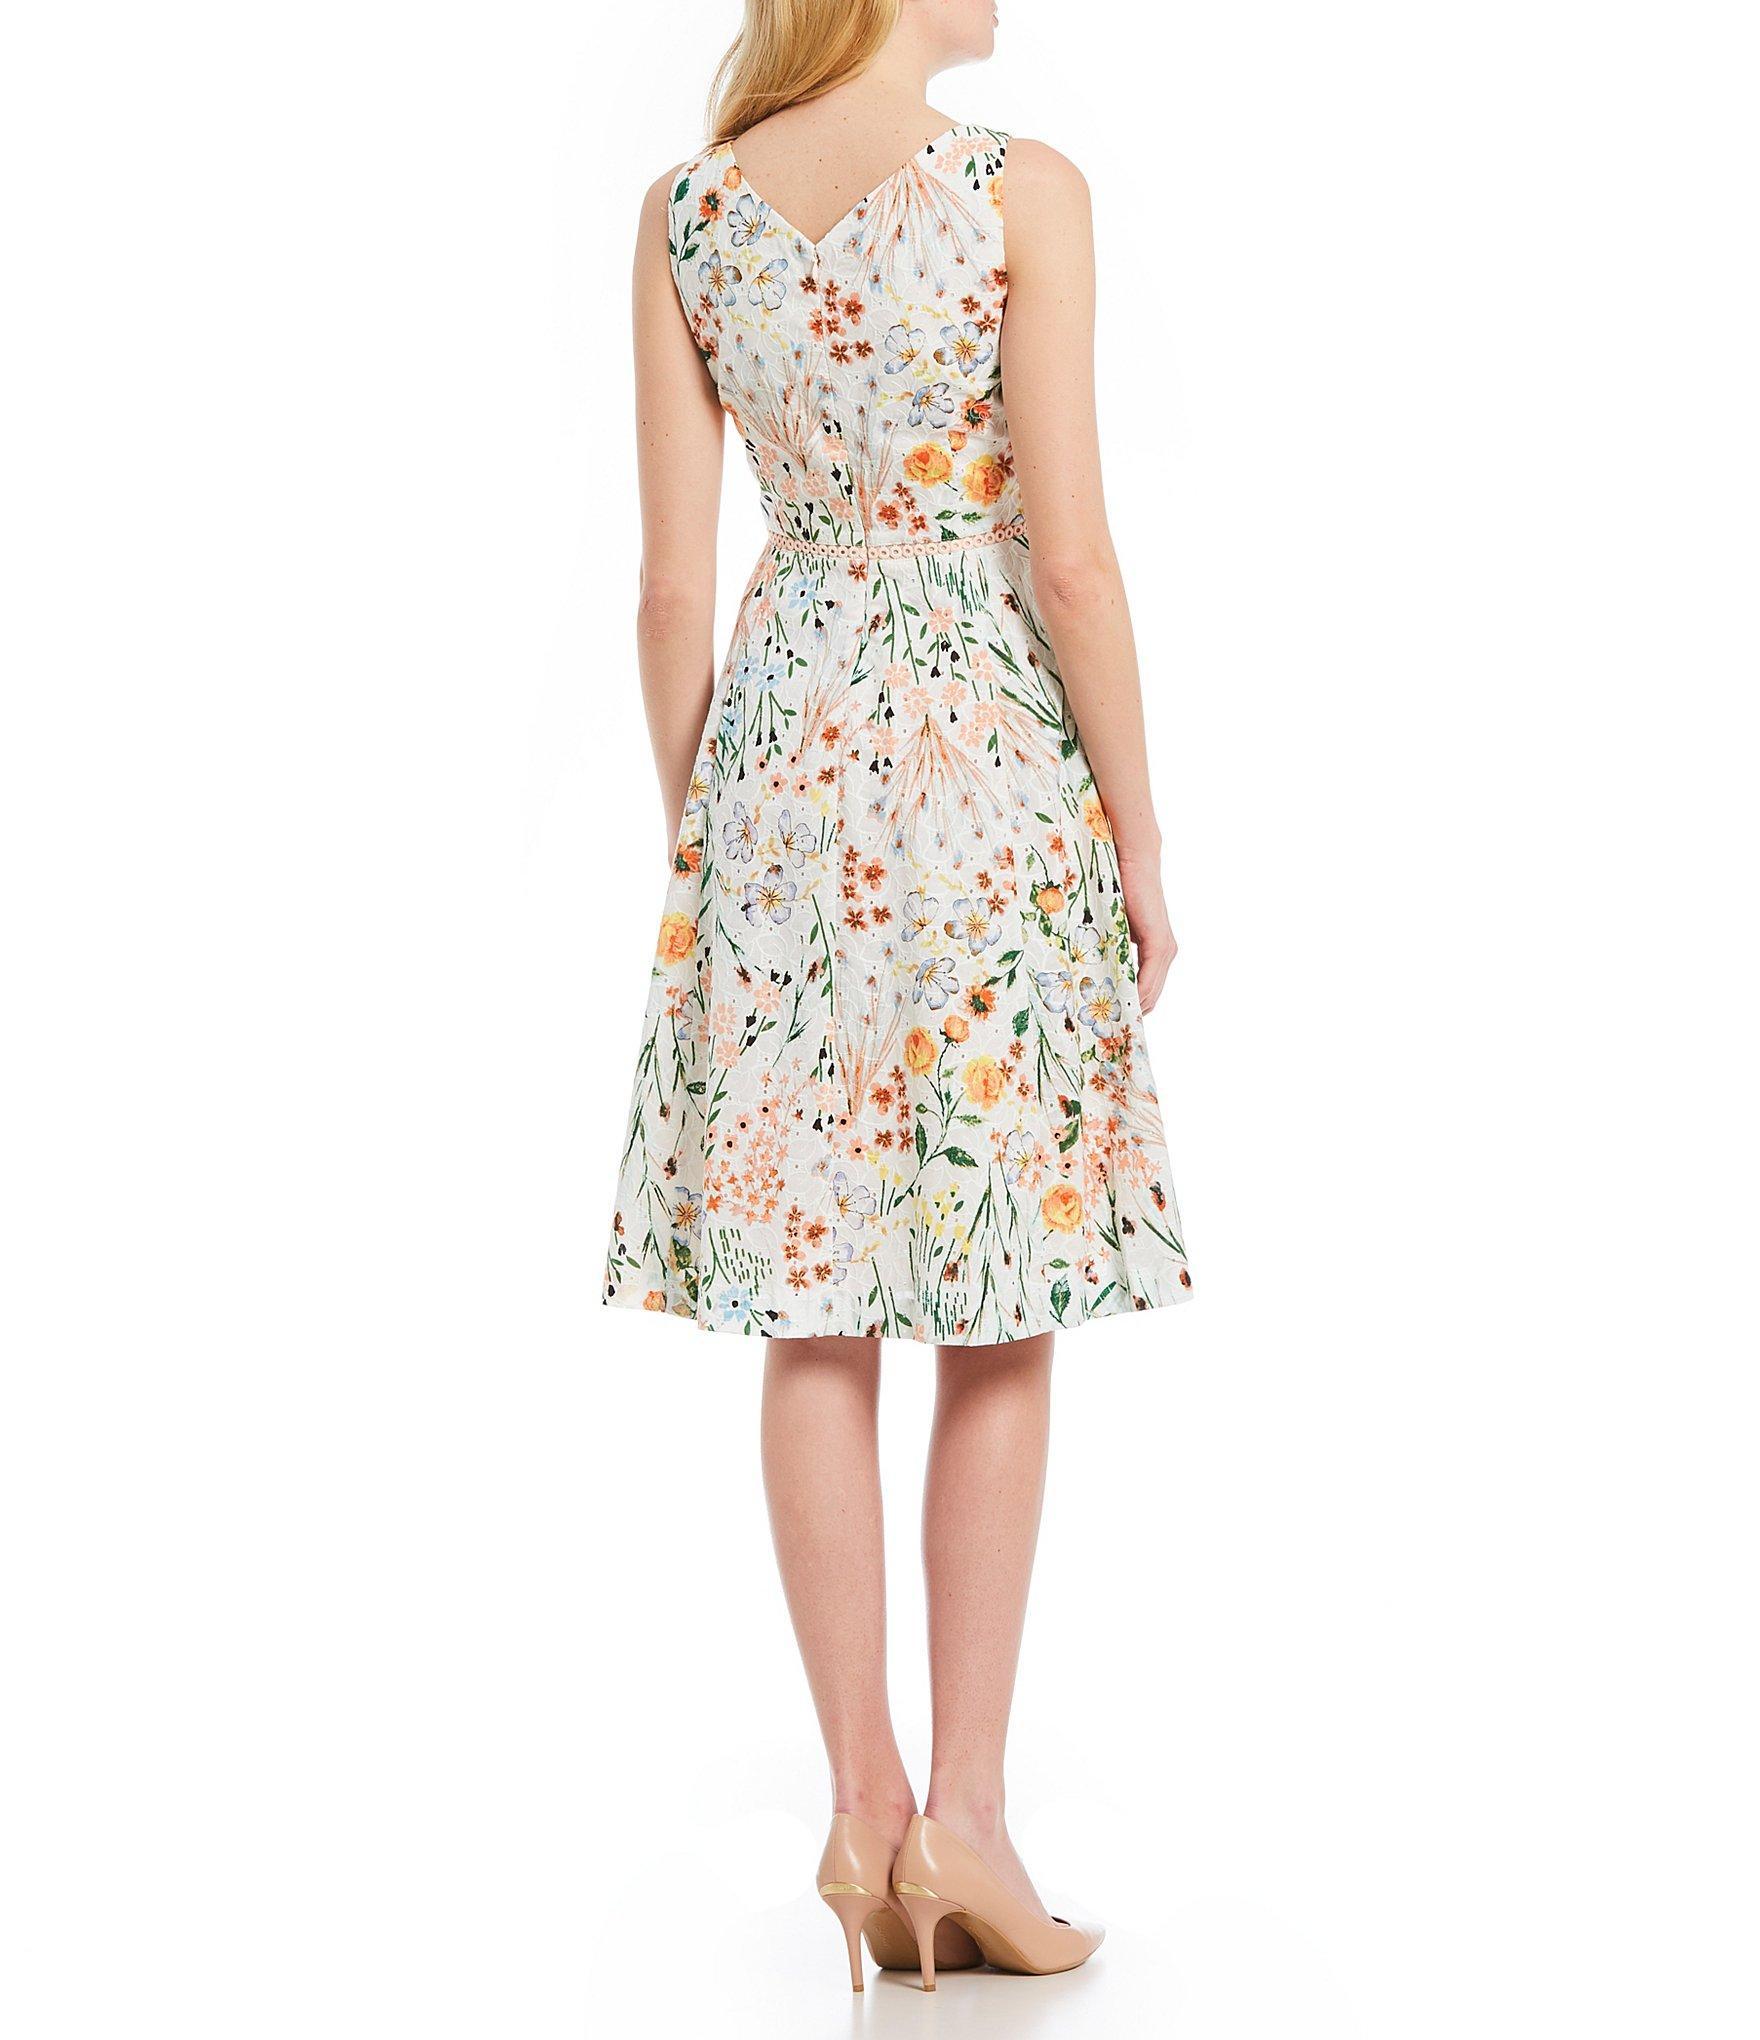 0514667b82c Calvin Klein - Multicolor Floral Lace A-line Dress - Lyst. View fullscreen